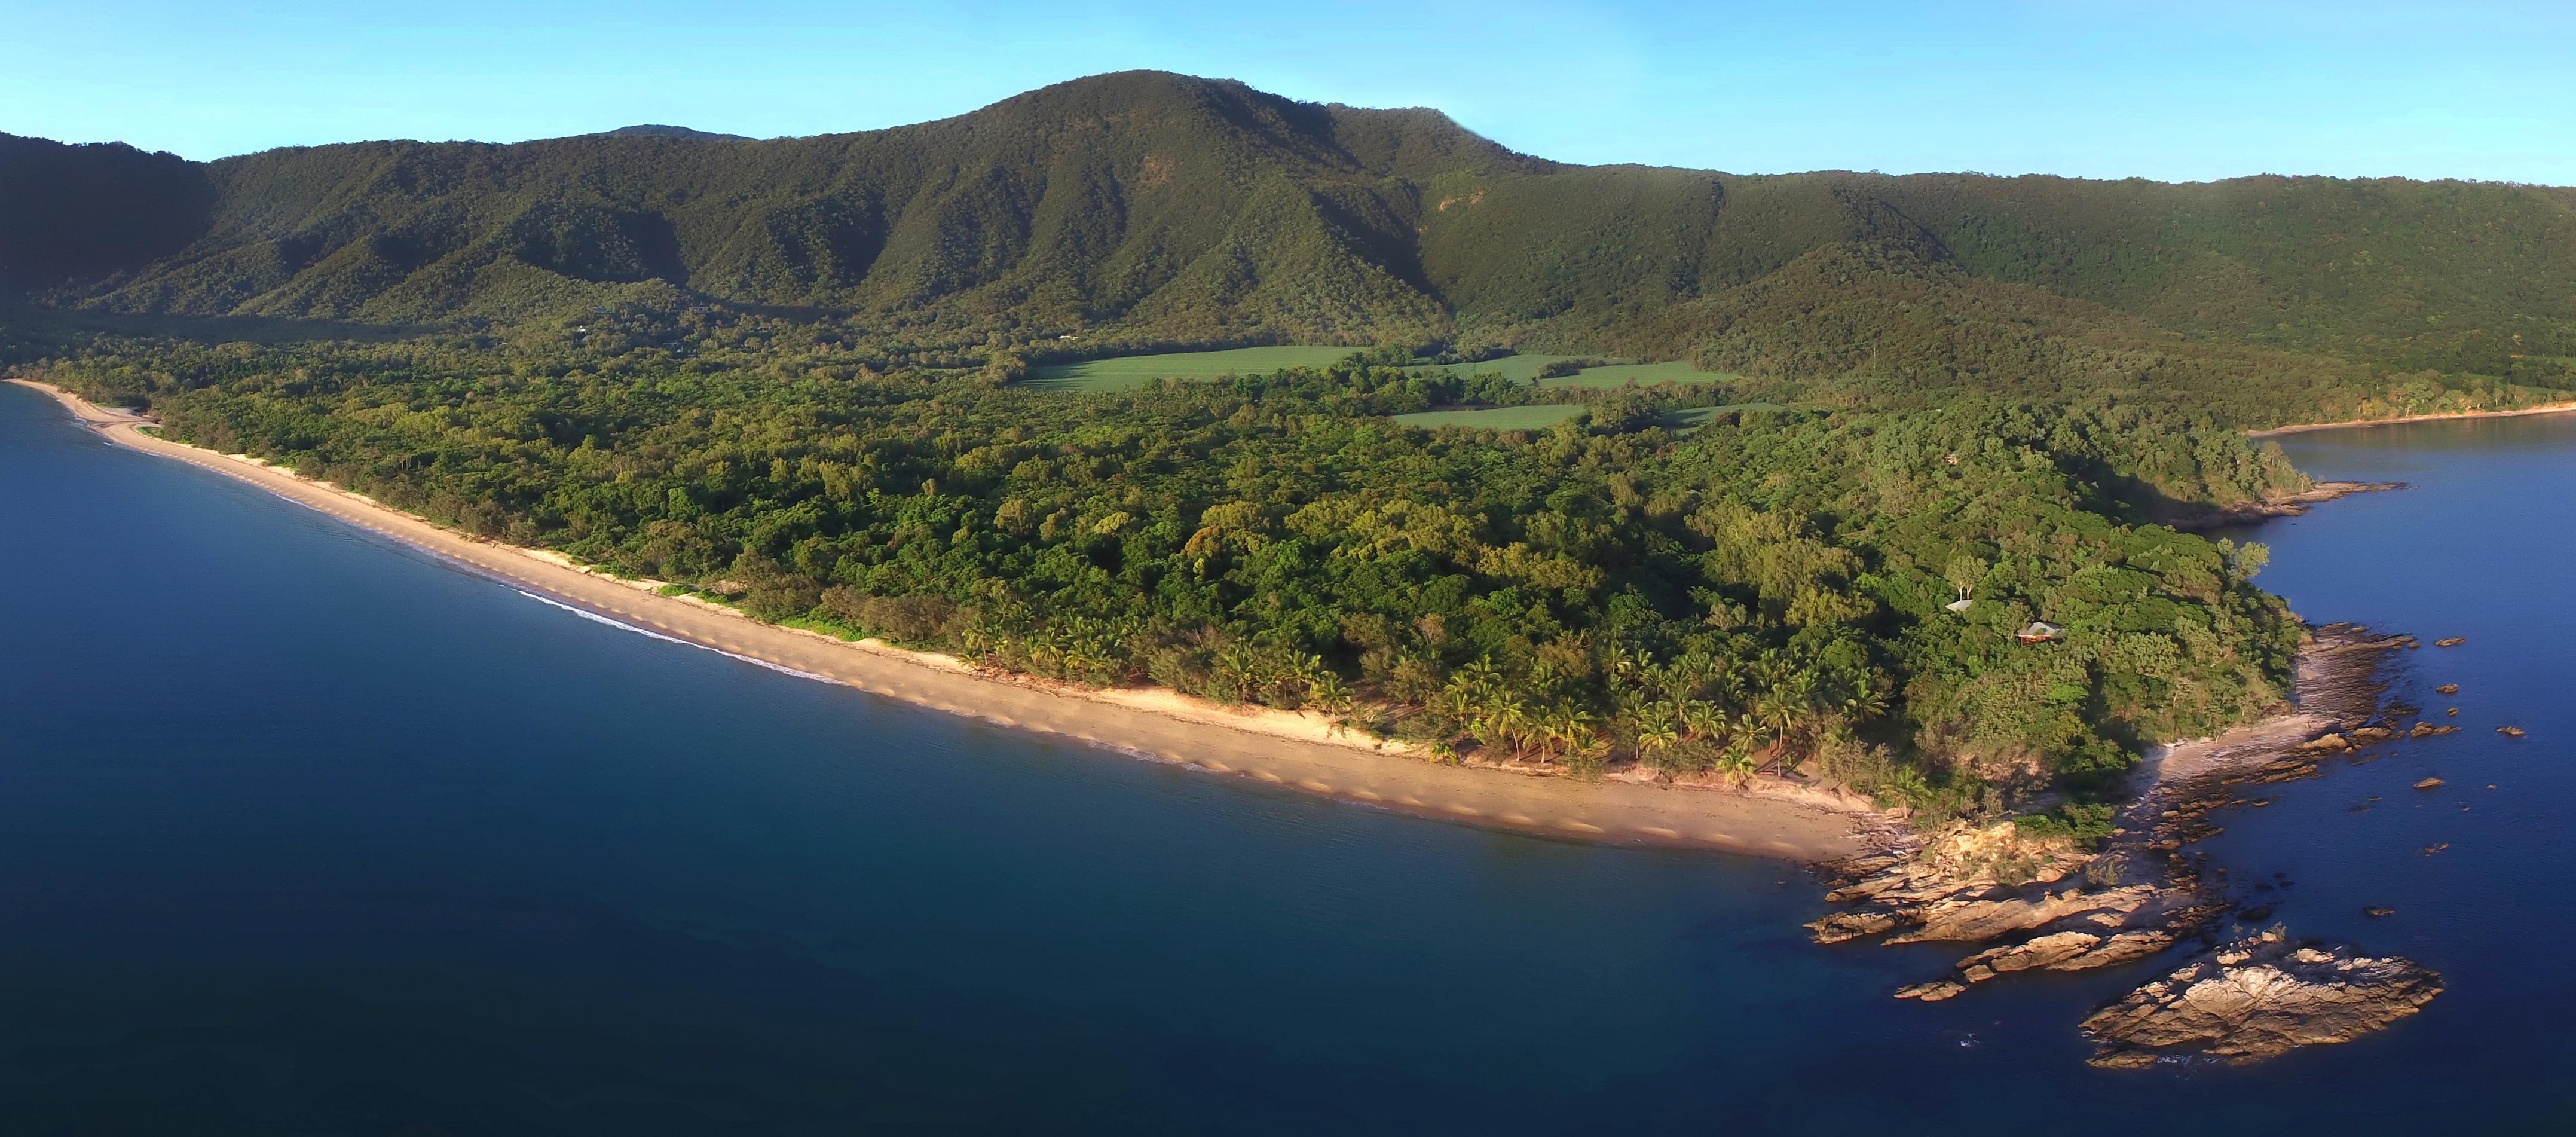 http://www.thalabeach.com.au/wp-content/uploads/2010/07/Thala_Beach_Nature_Reserve_2016__150.jpg